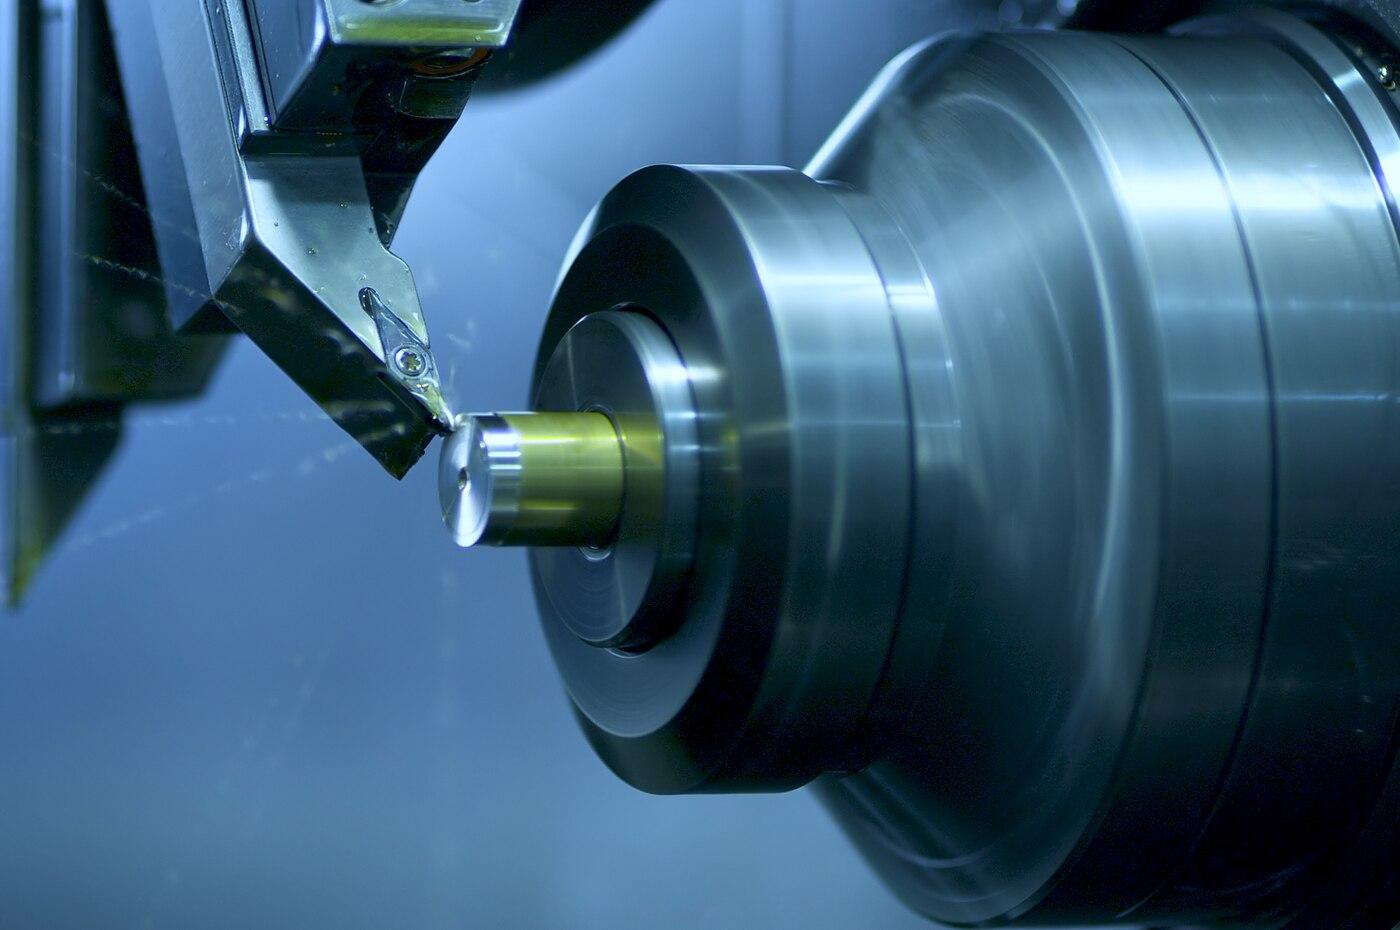 A quick comparison of CNC machine tools